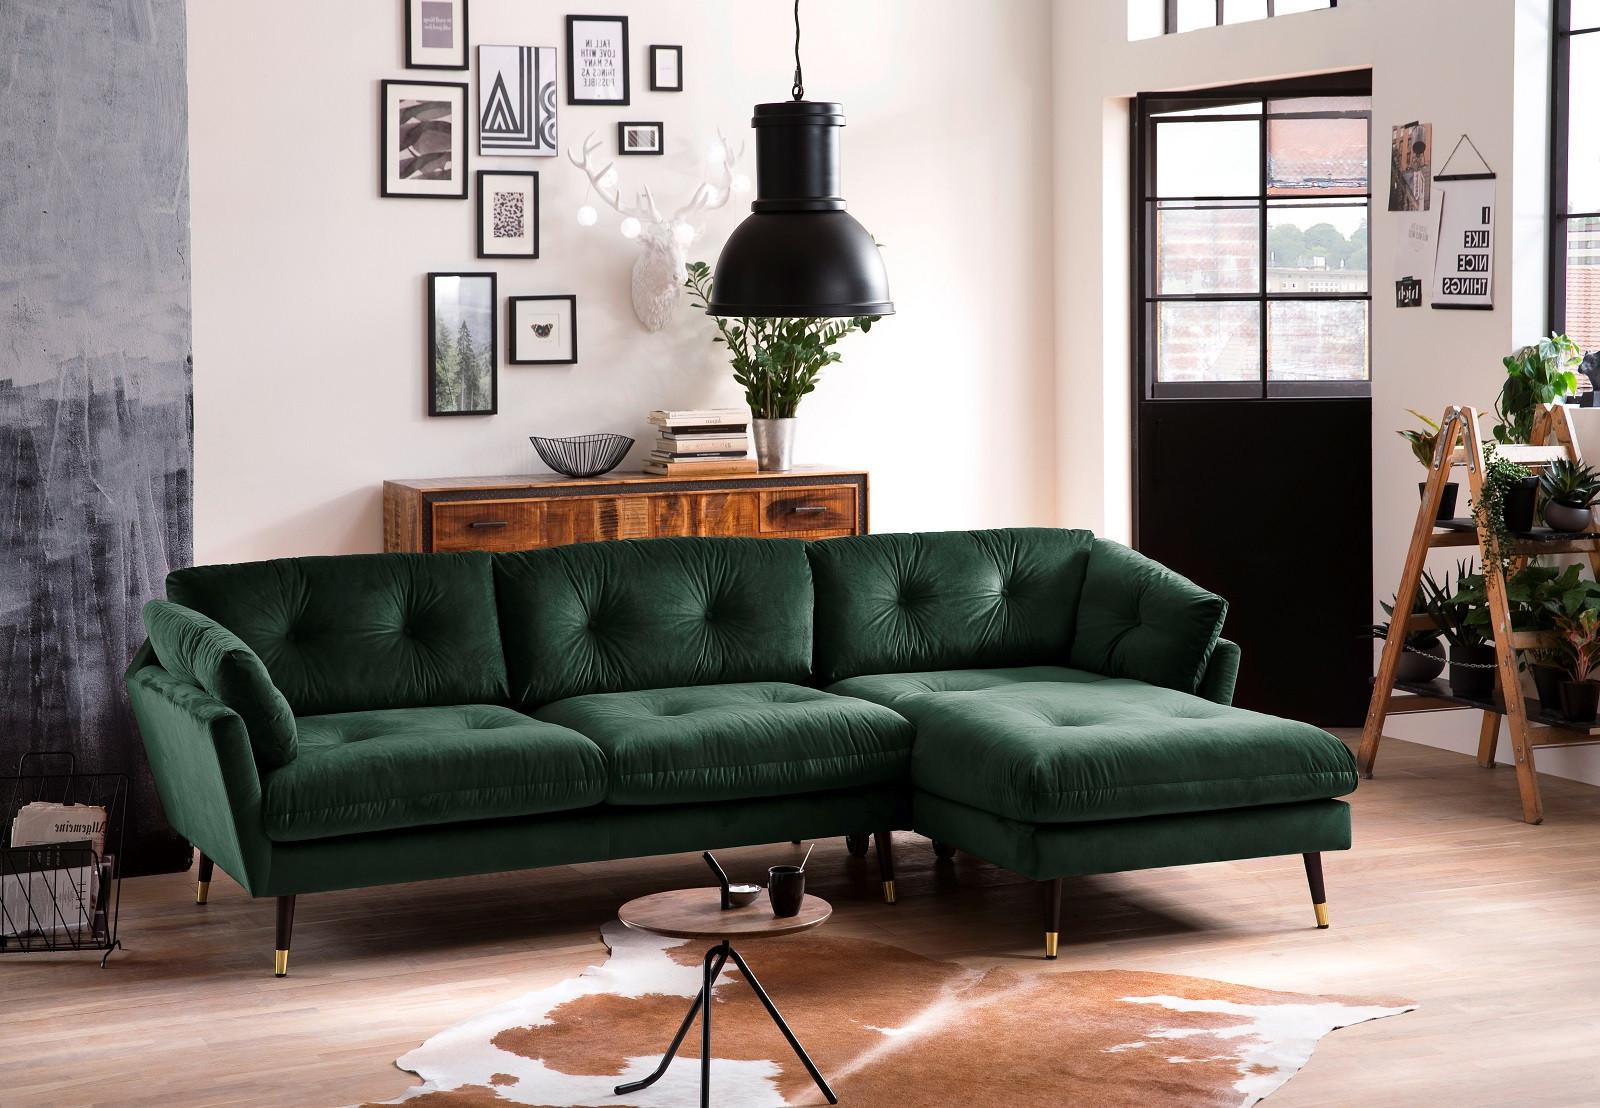 Prime Corner Sofa Sets Japan Creativecarmelina Interior Chair Design Creativecarmelinacom